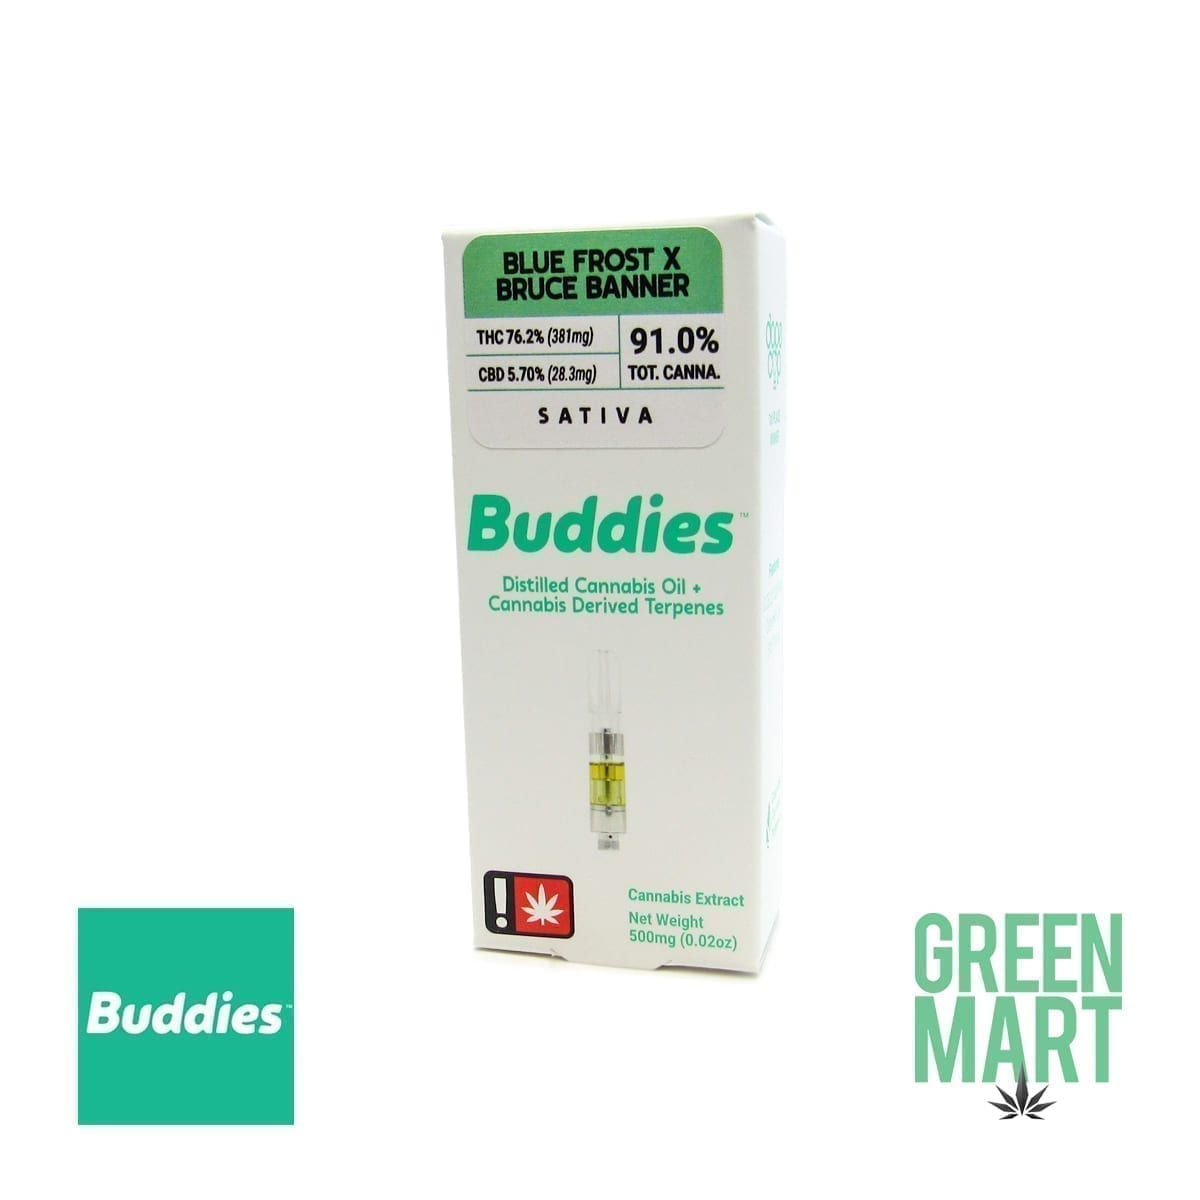 Buddies Brand Distillate Cartridge - Blue Frost X Bruce Banner